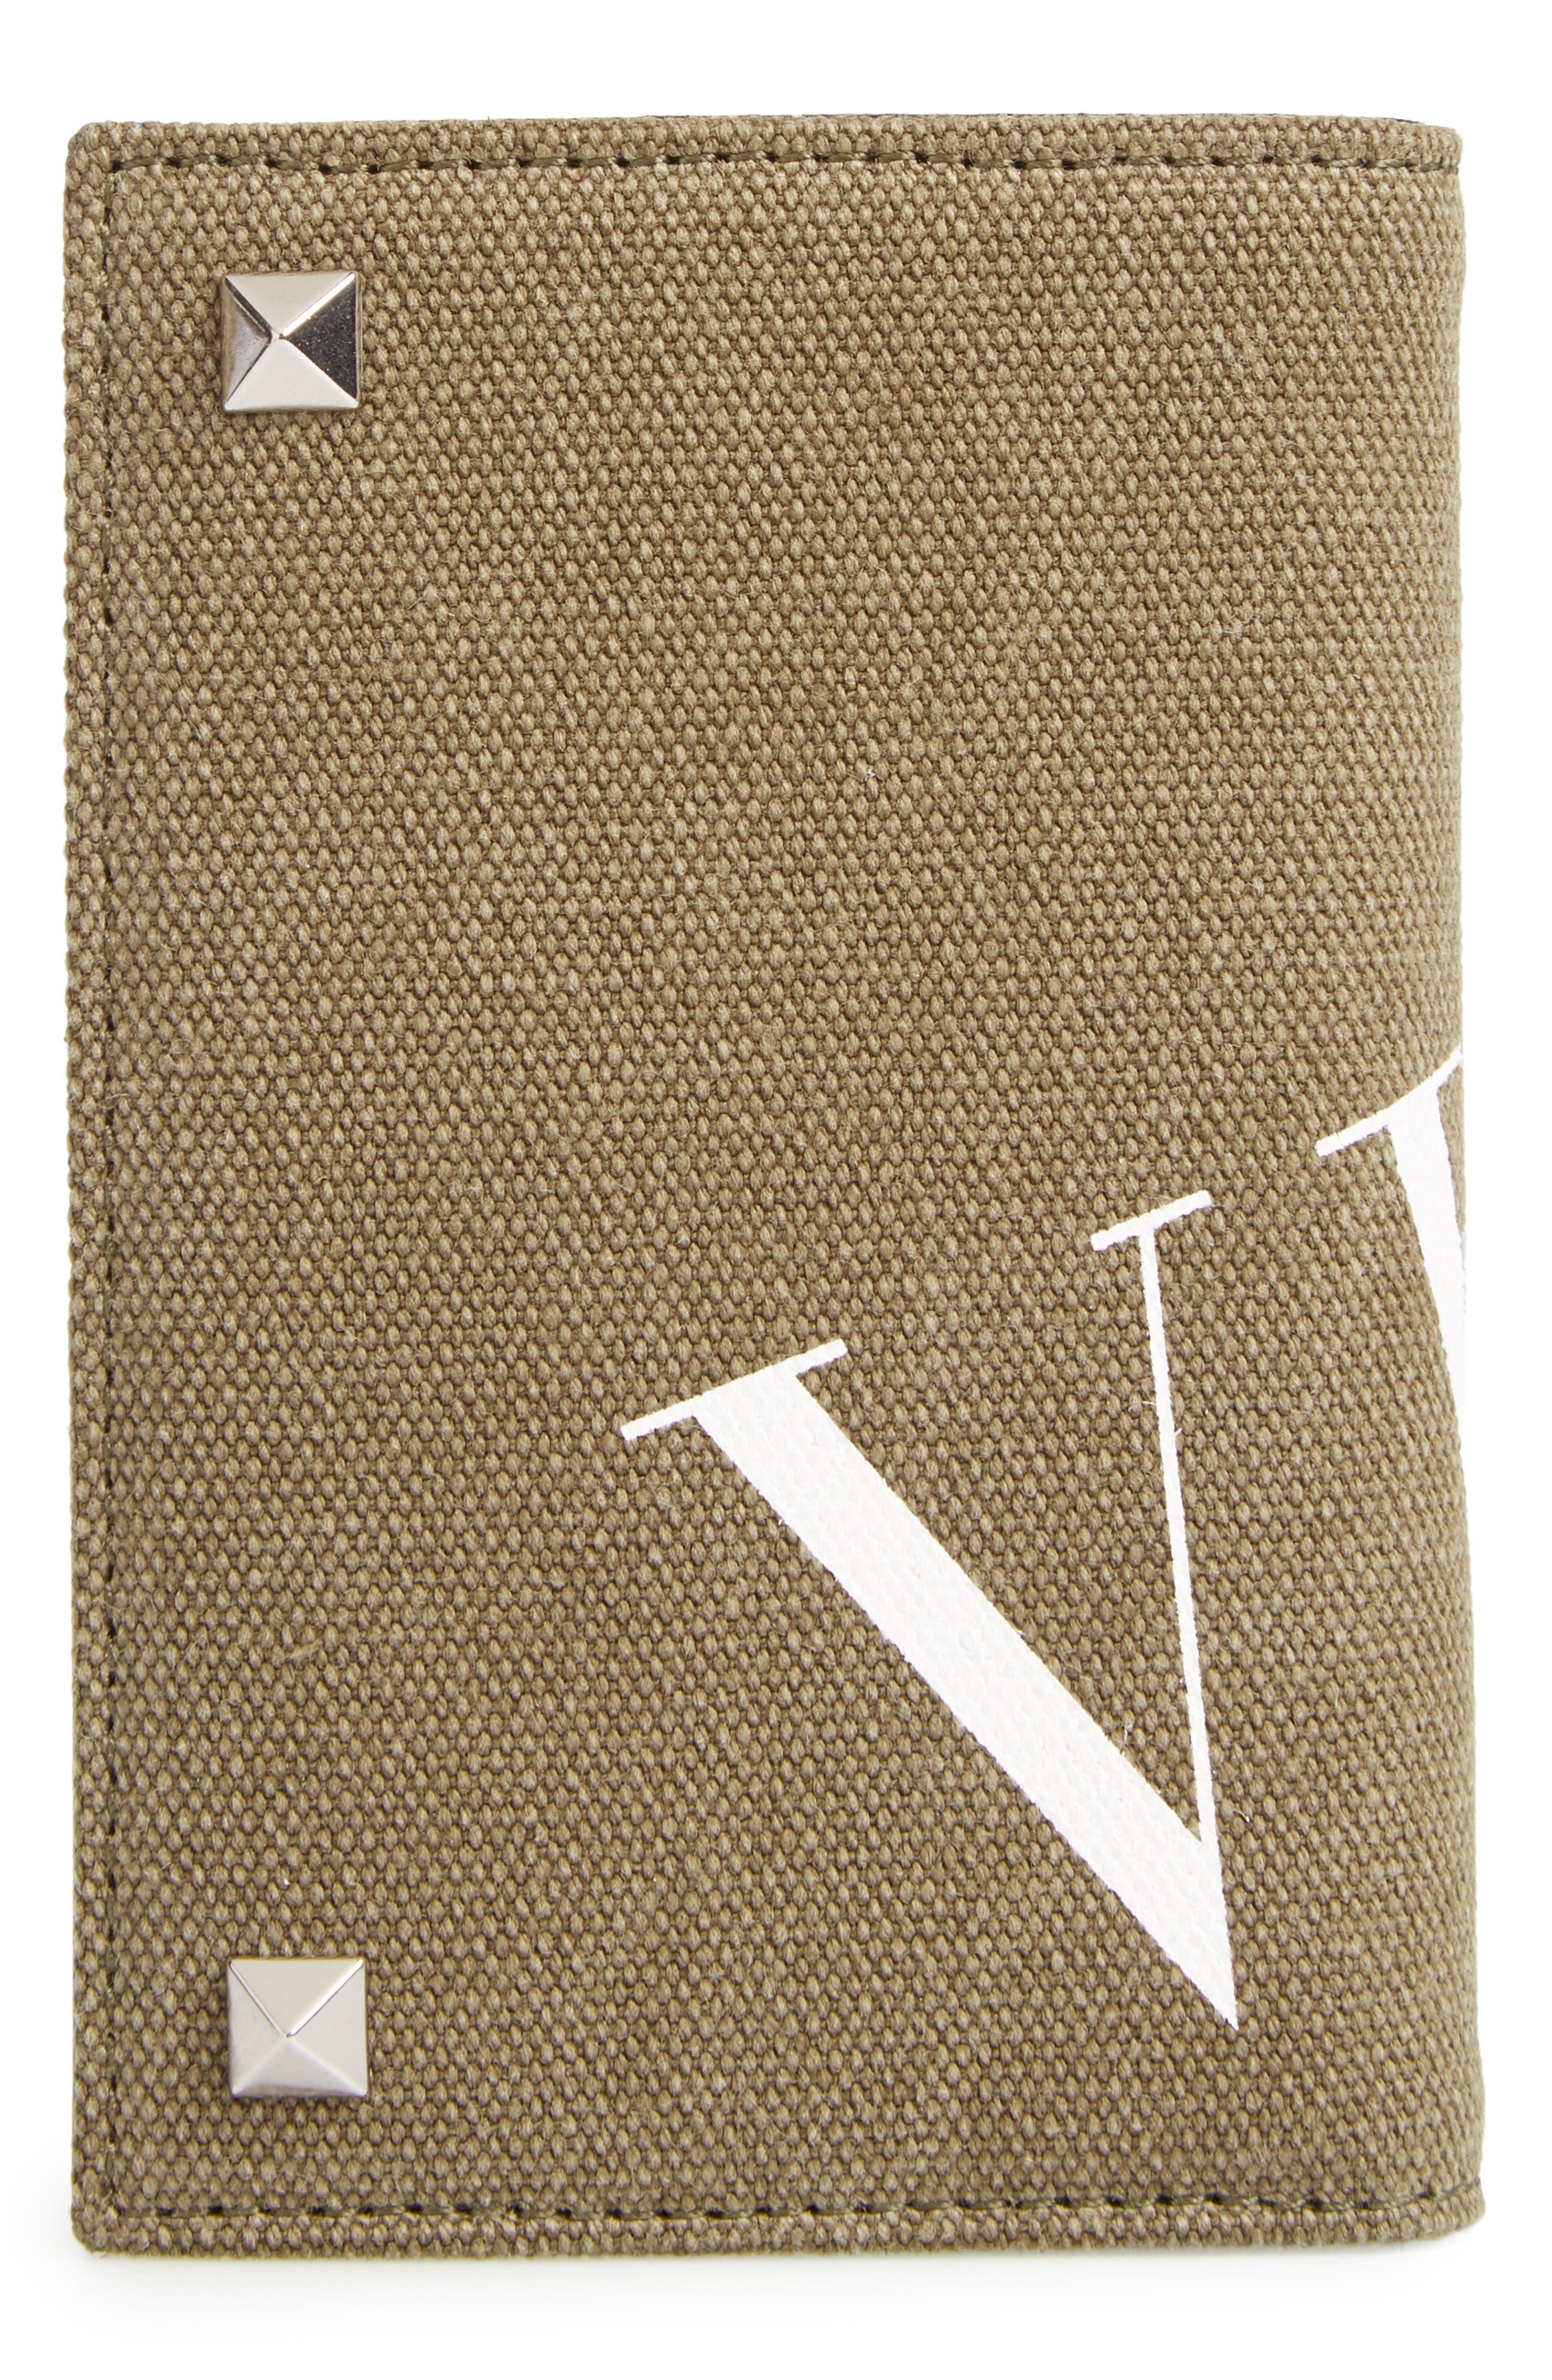 GARAVANI Stud Canvas Wallet,                             Alternate thumbnail 3, color,                             370